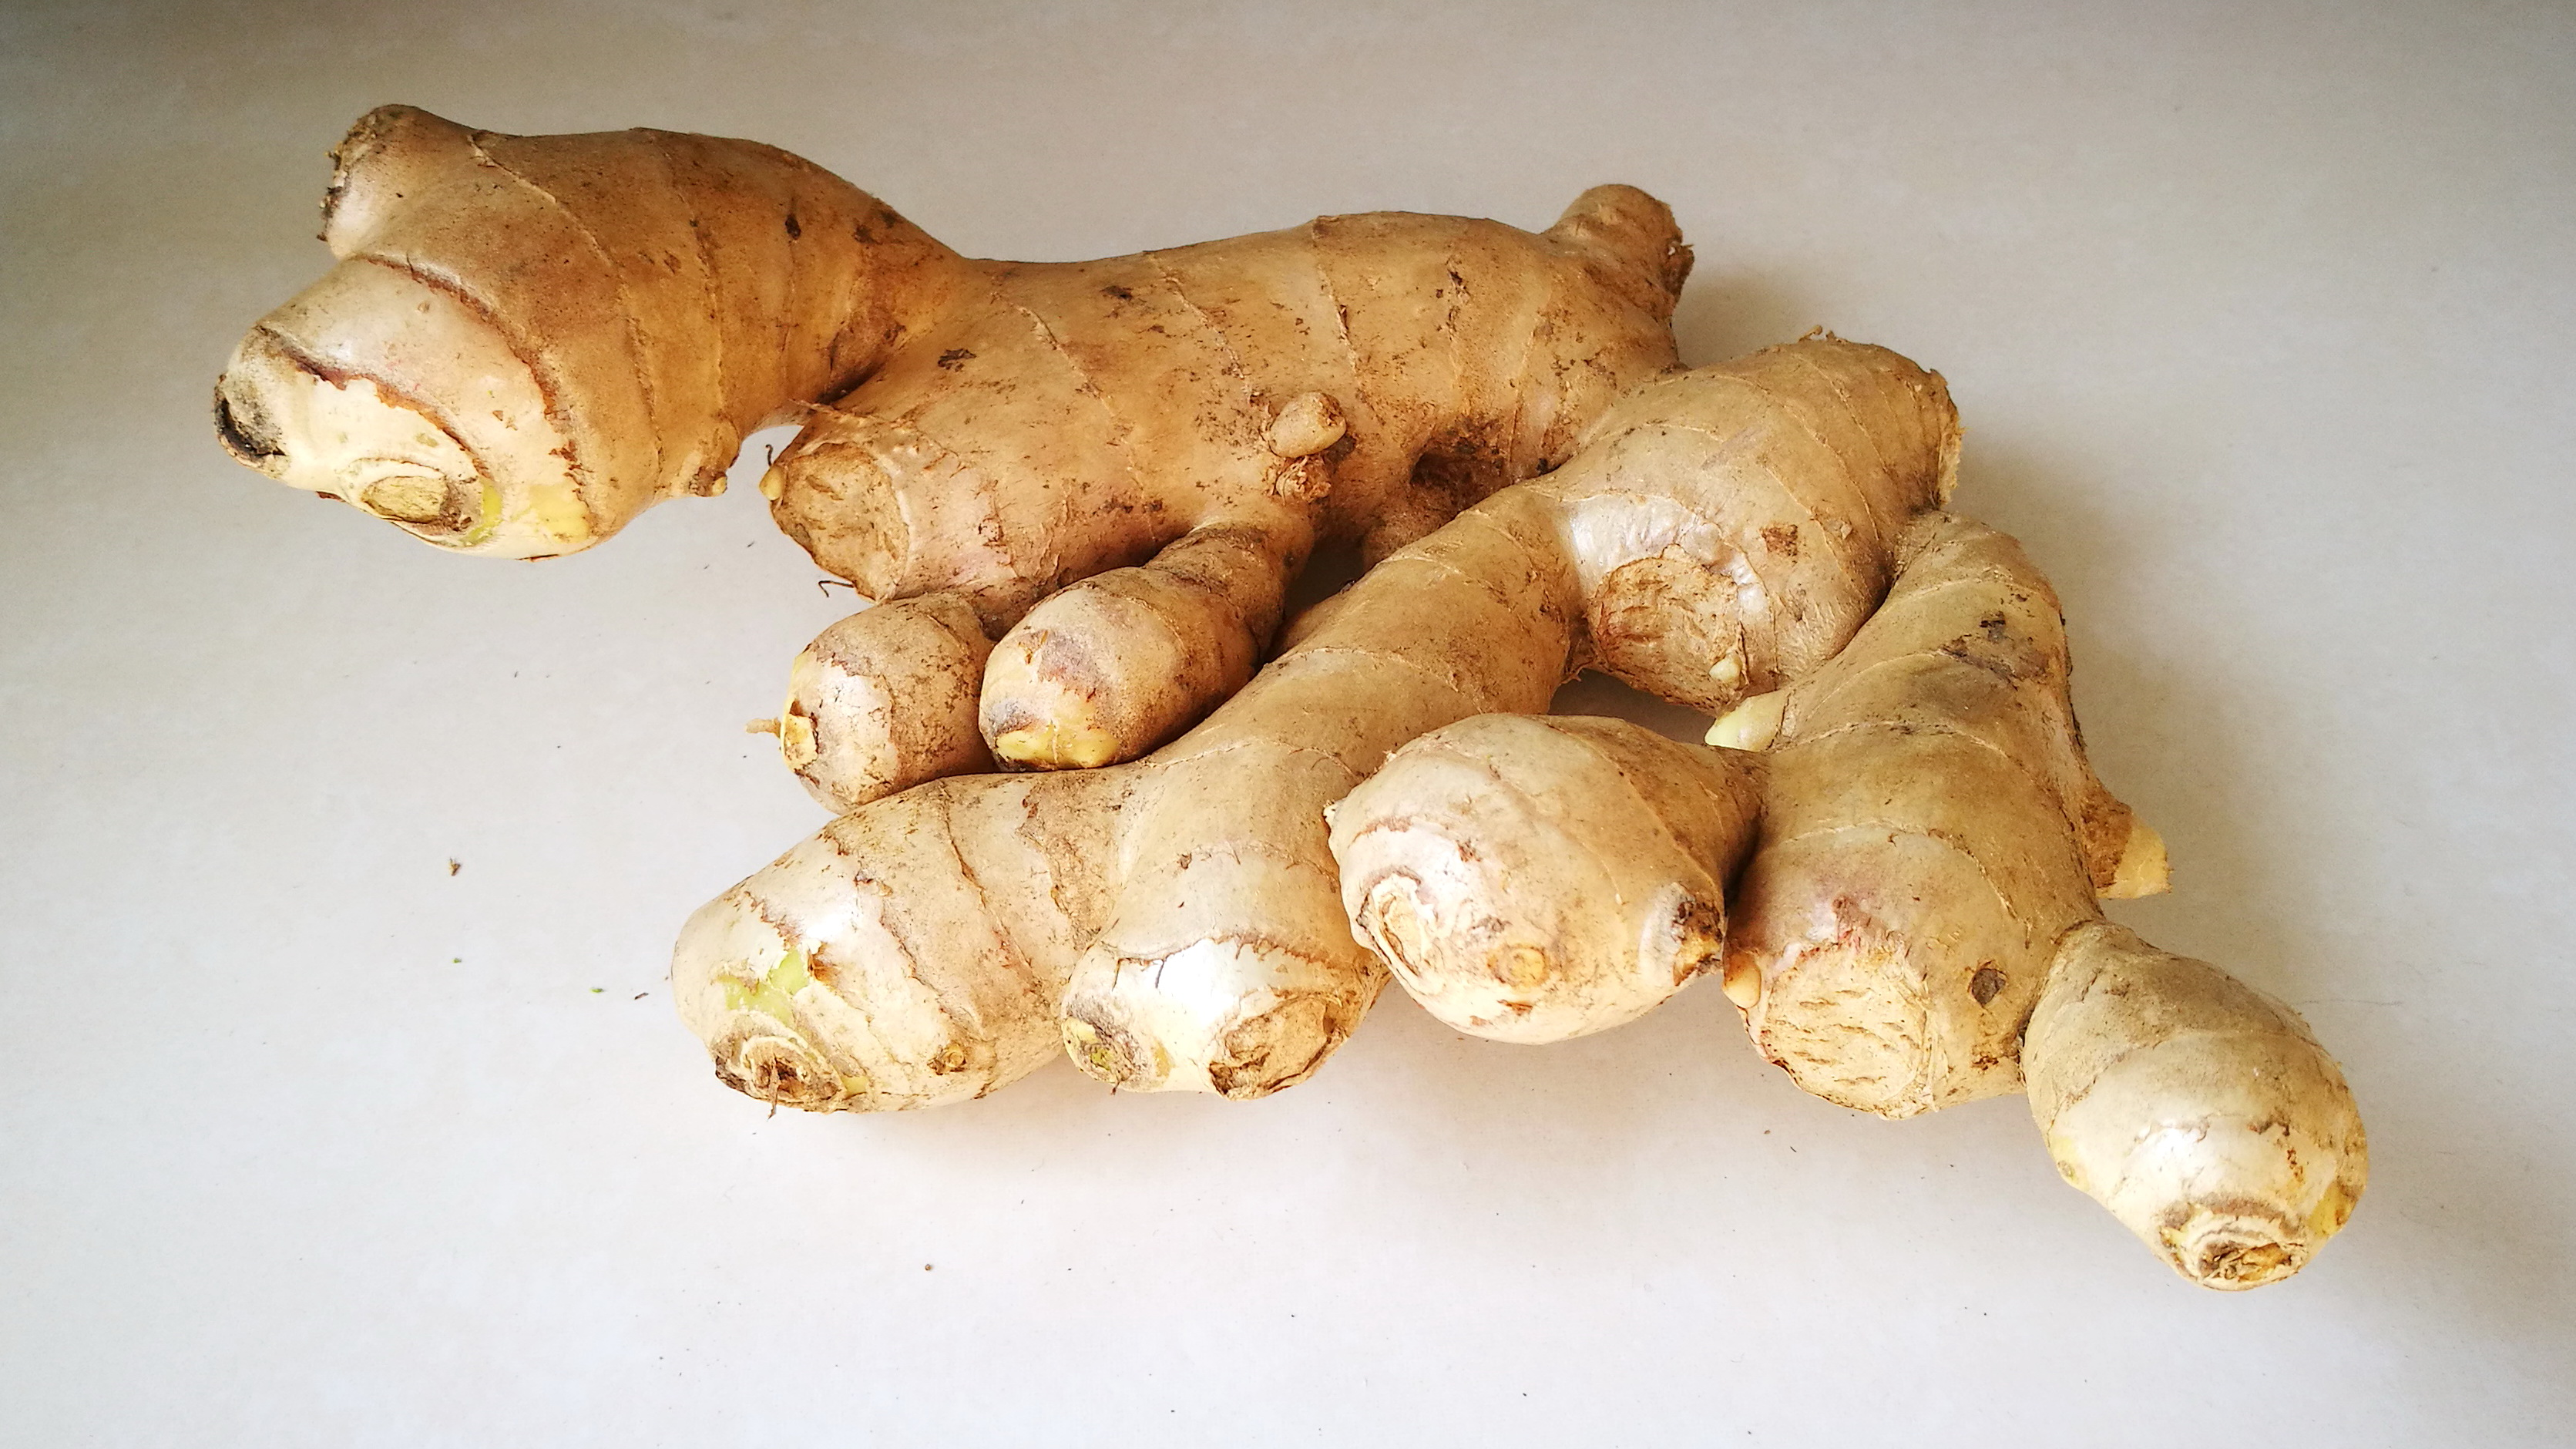 File:Ginger rhizome.jpg - Wikimedia Commons